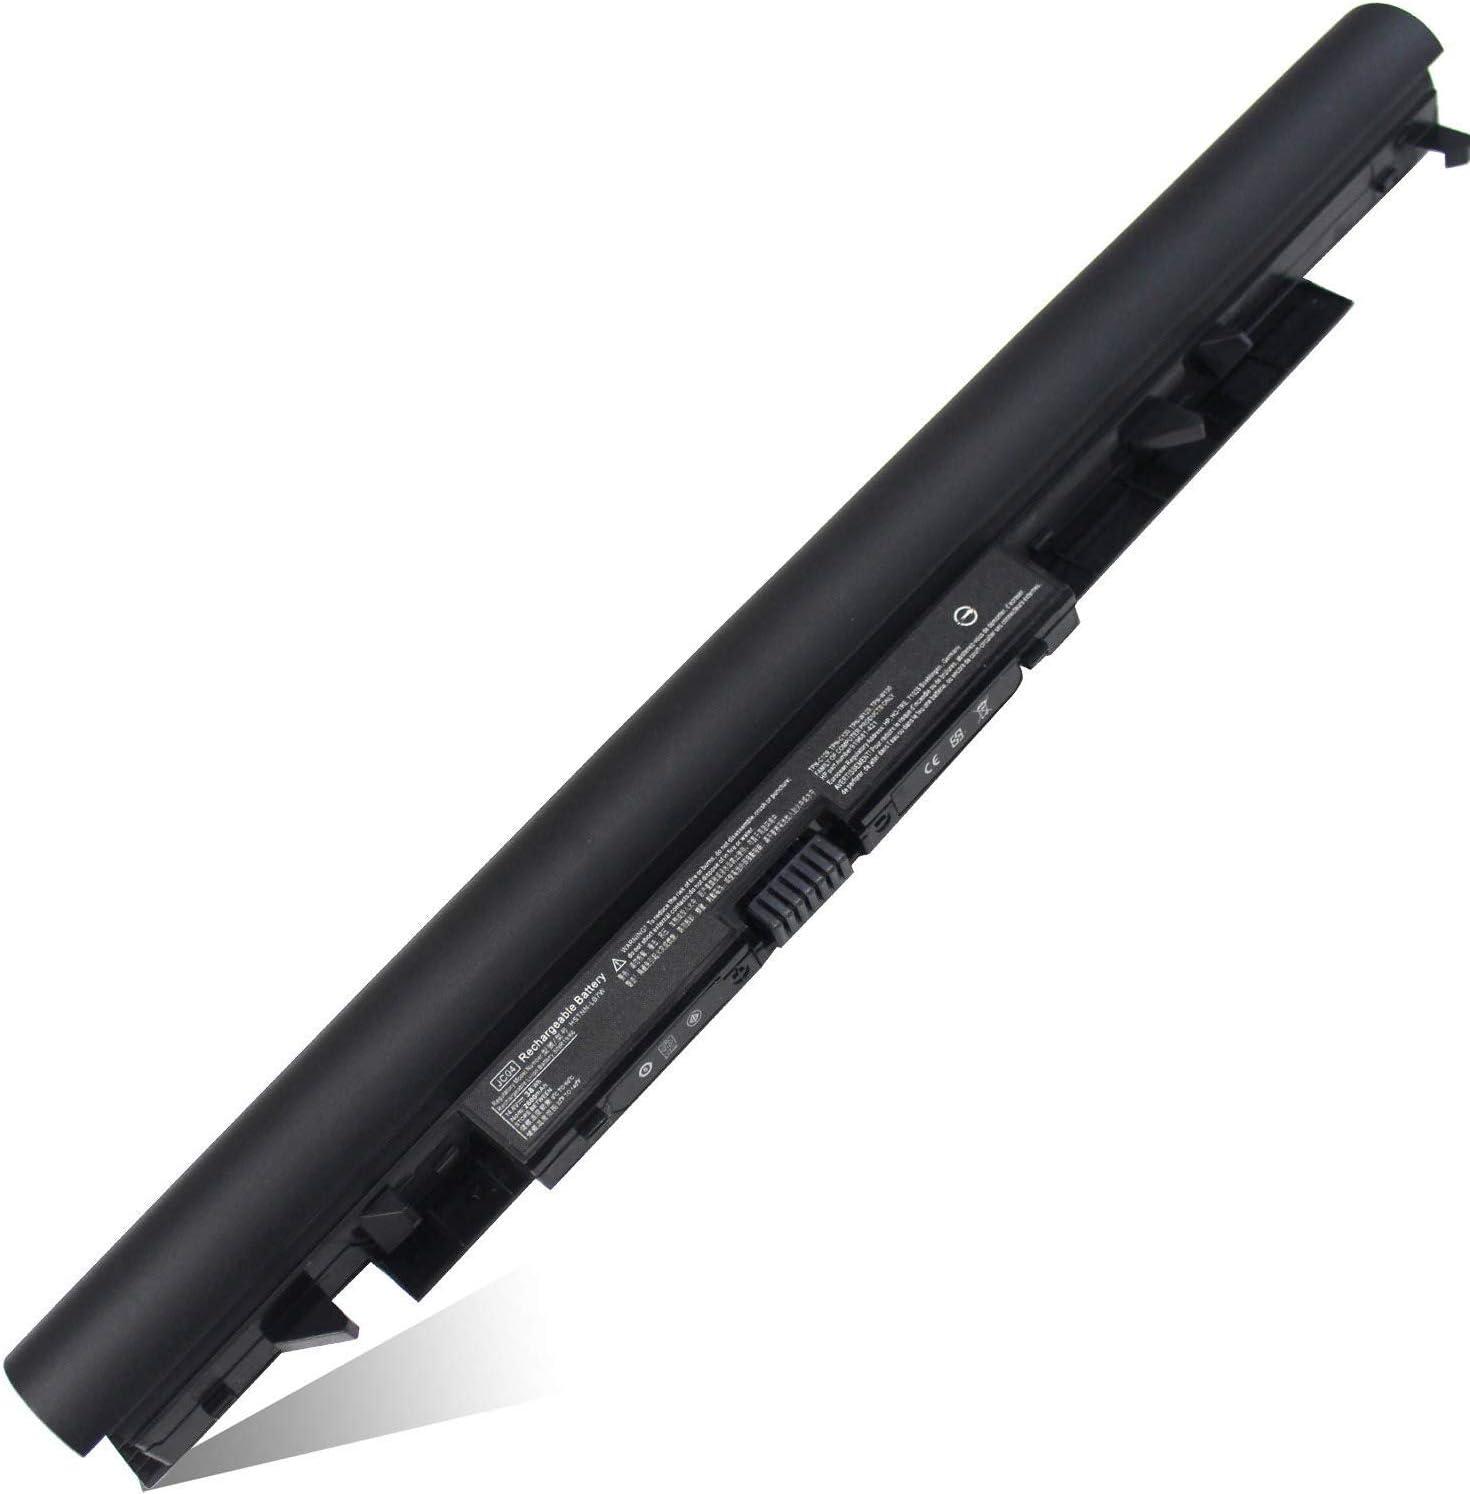 Gomarty JC03 JC04 Laptop Battery Compatible with HP 255 G6 250 G6 Pavilion 15-BS000 15-BW000 17-BS000 919700-850 919701-850 919681-421 TPN-C129 HSTNN-DB8E HSTNN-H7BX HSTNN-L67N HSTNN-PB6Y HSTNN-LB7W